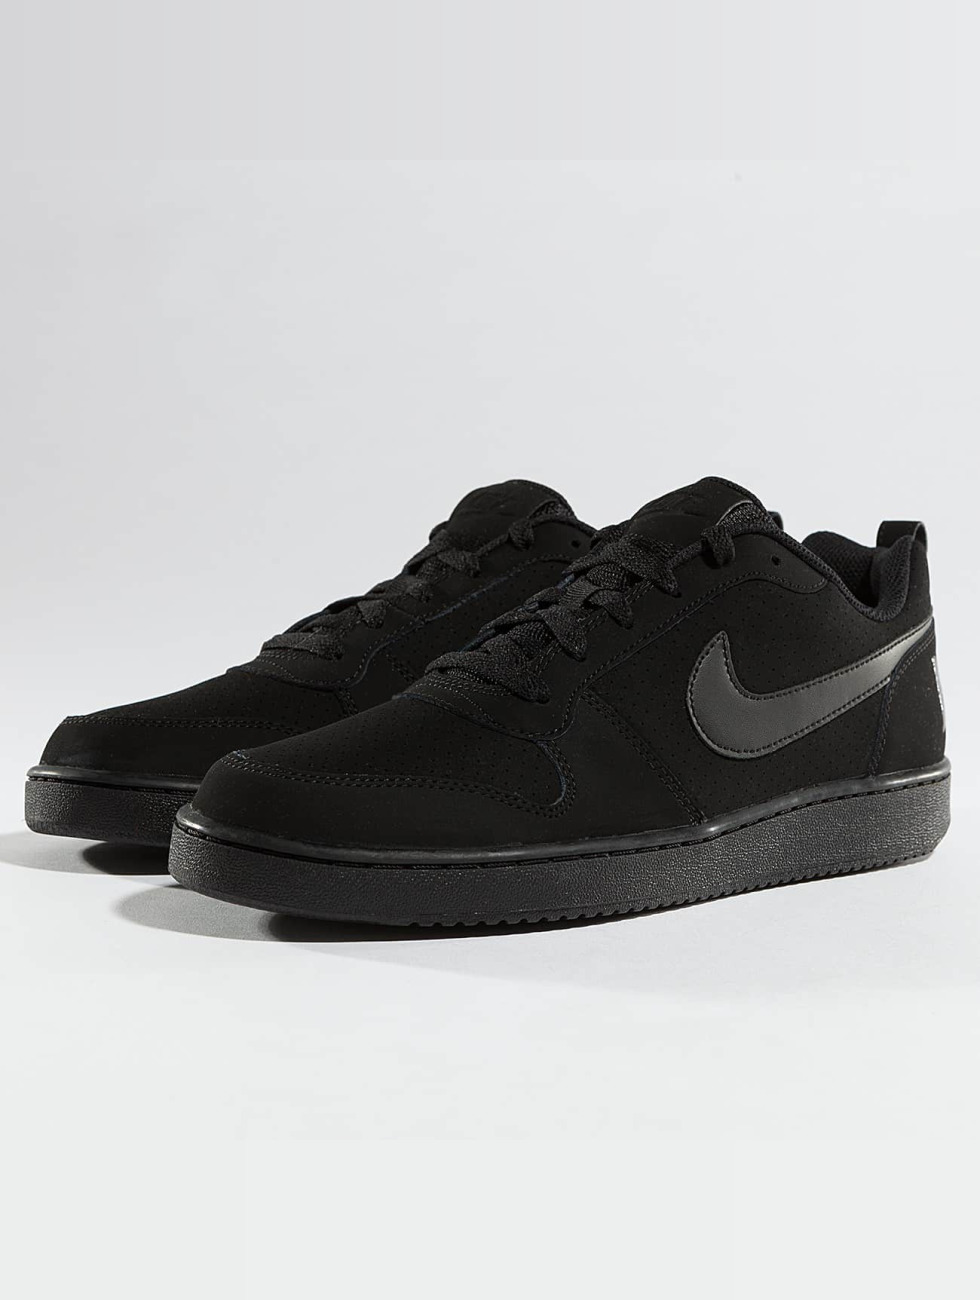 Nike Chaussures Court  Noir  Baskets Quartier Bas Noir  422238 f4e70d